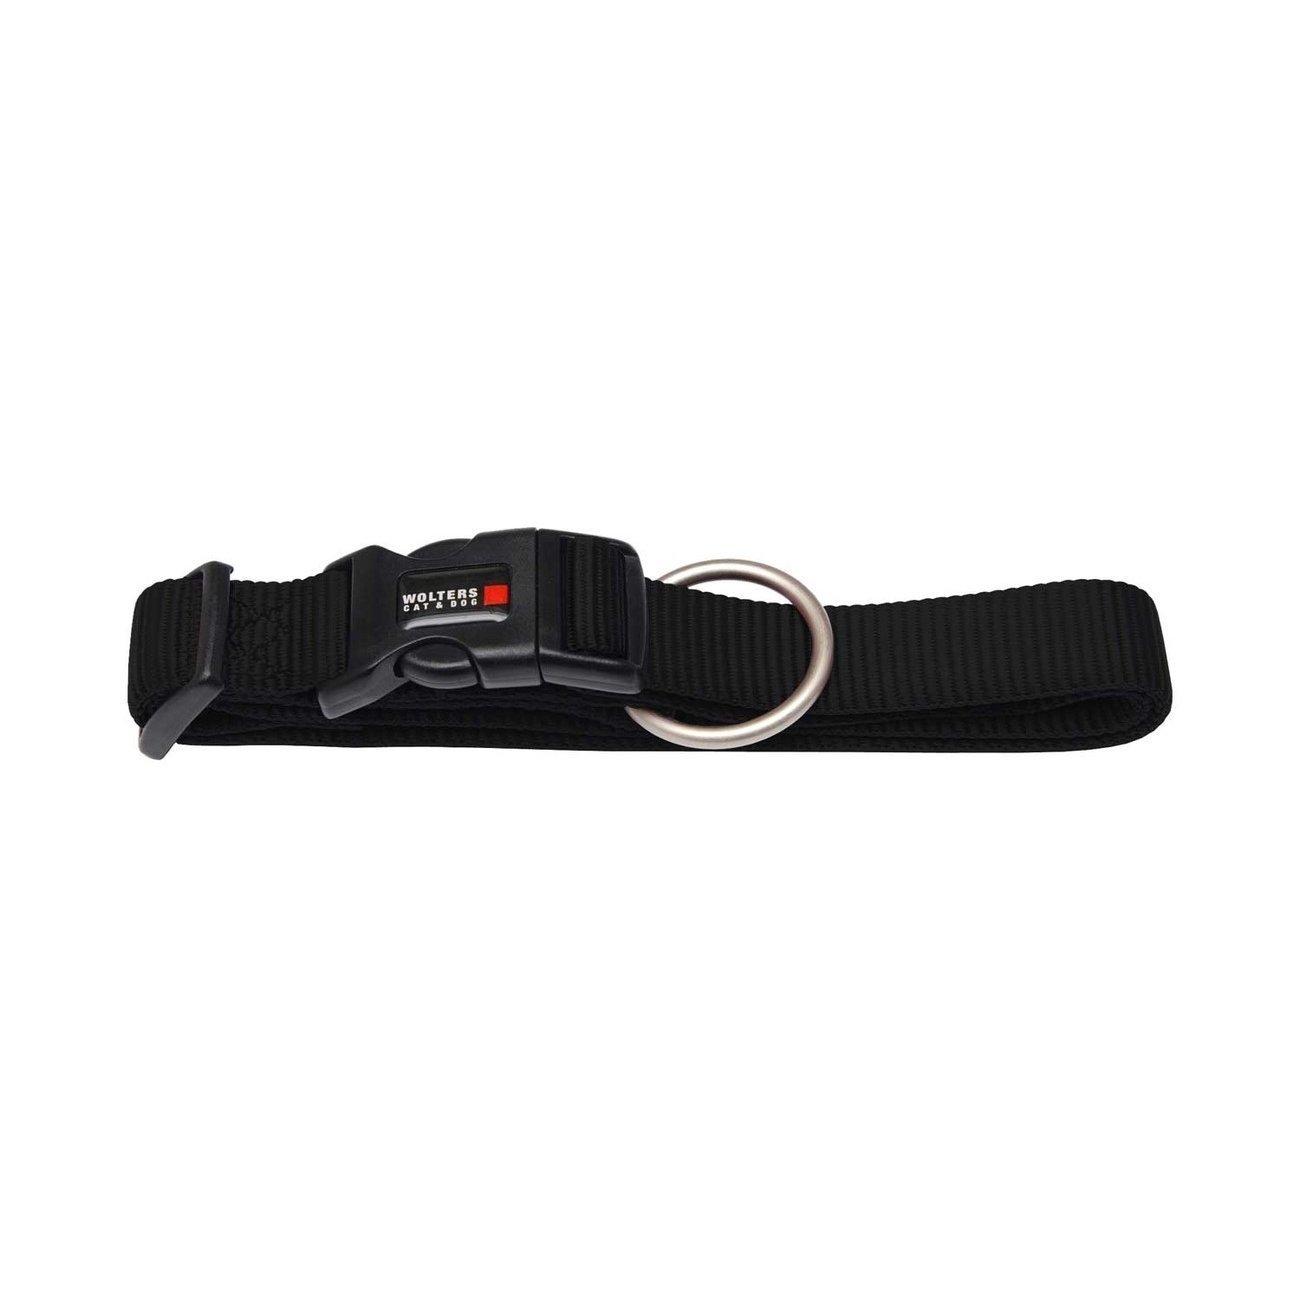 Wolters Halsband Extra Breit Professional Nylon, Bild 10